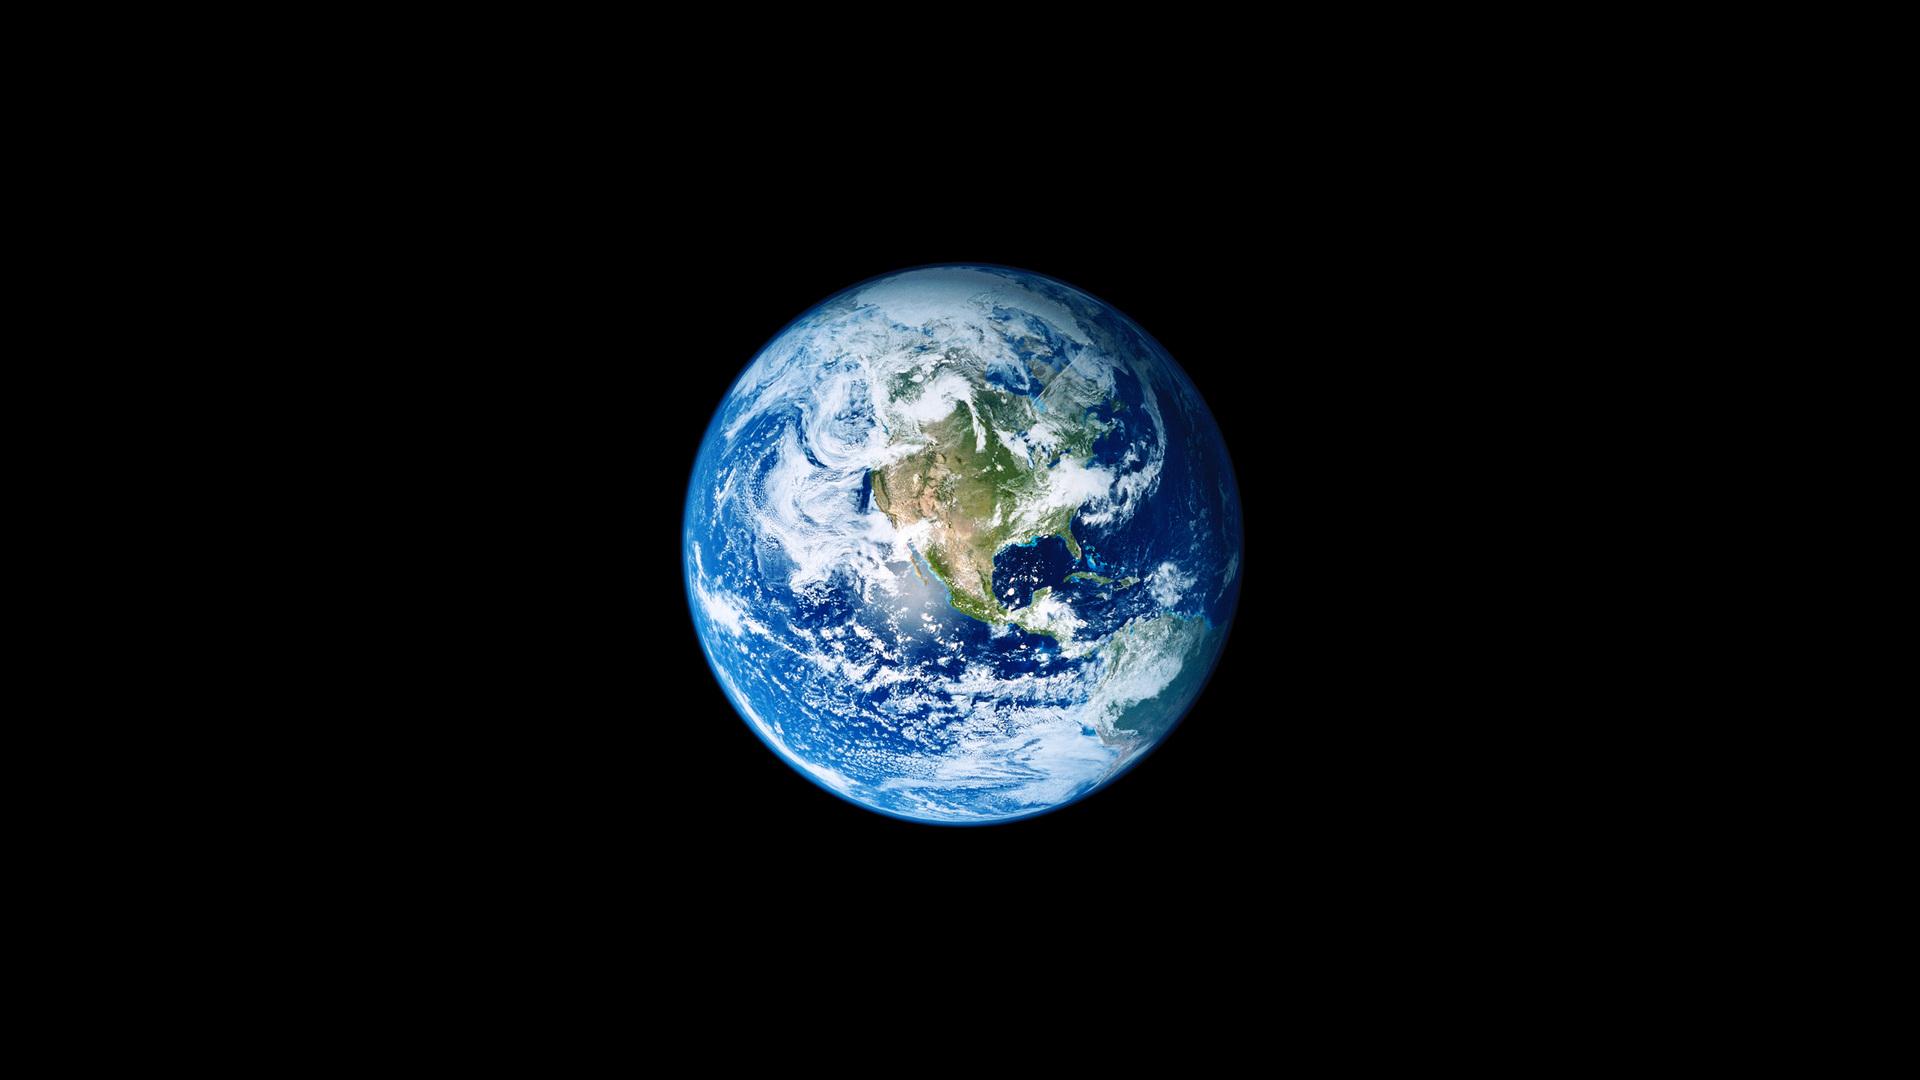 Earth Wallpaper Full Hd: 1920x1080 Ios 11 Earth 4k Laptop Full HD 1080P HD 4k